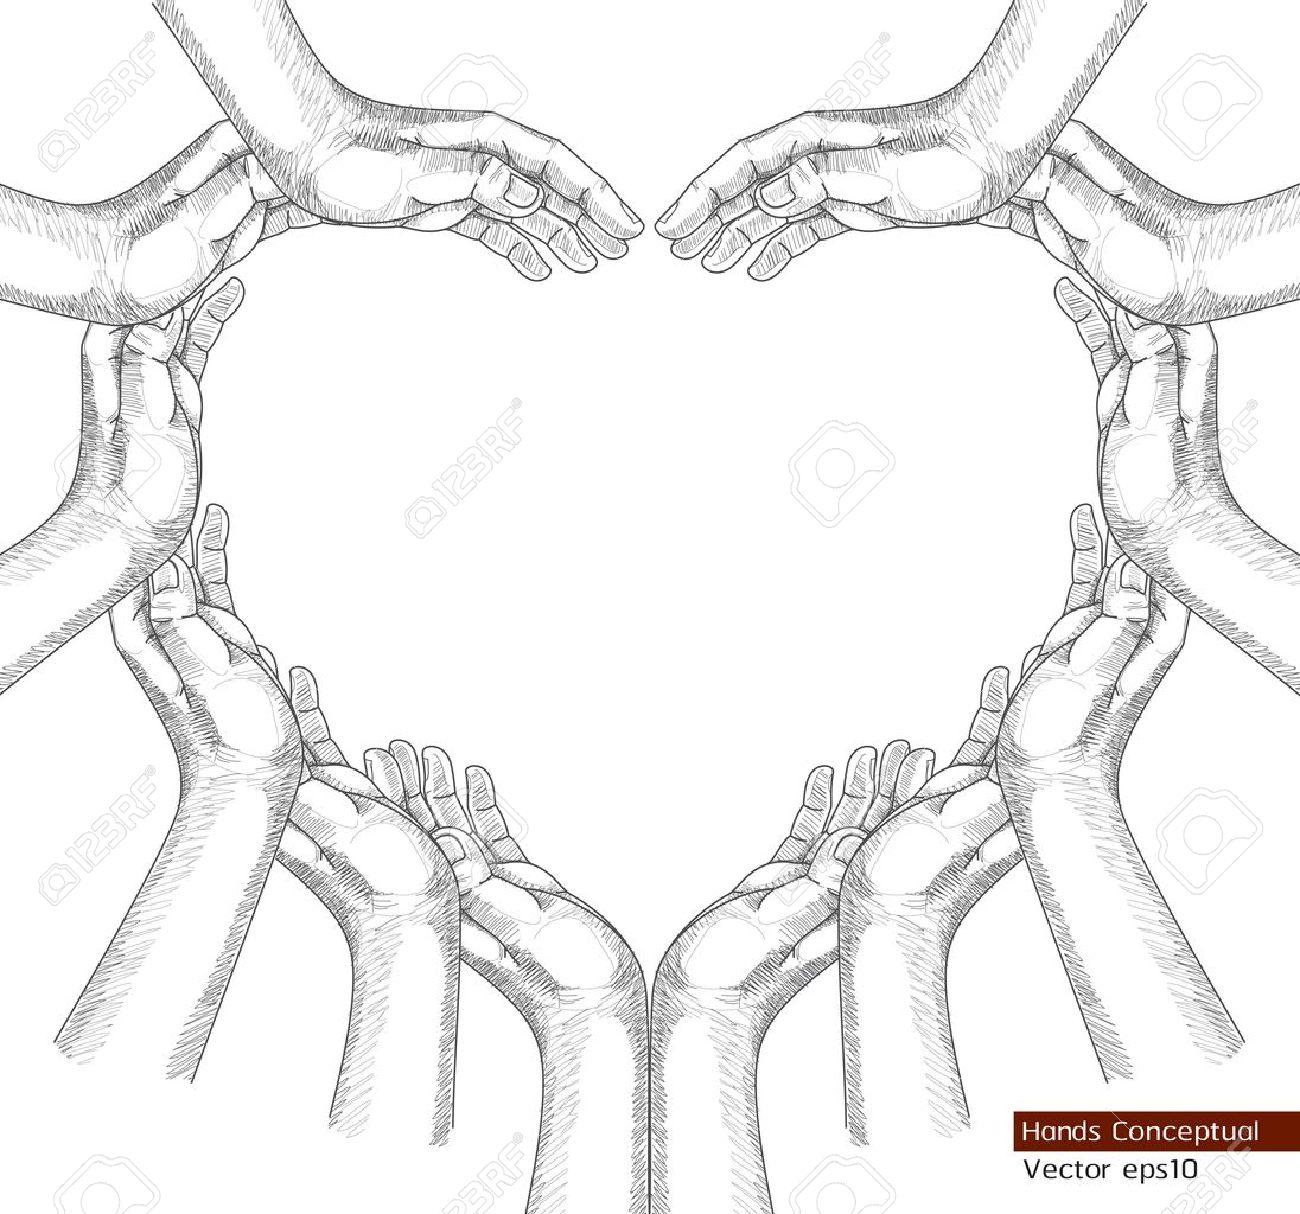 Hands Drawing Conceptual Stock Vector - 18758993